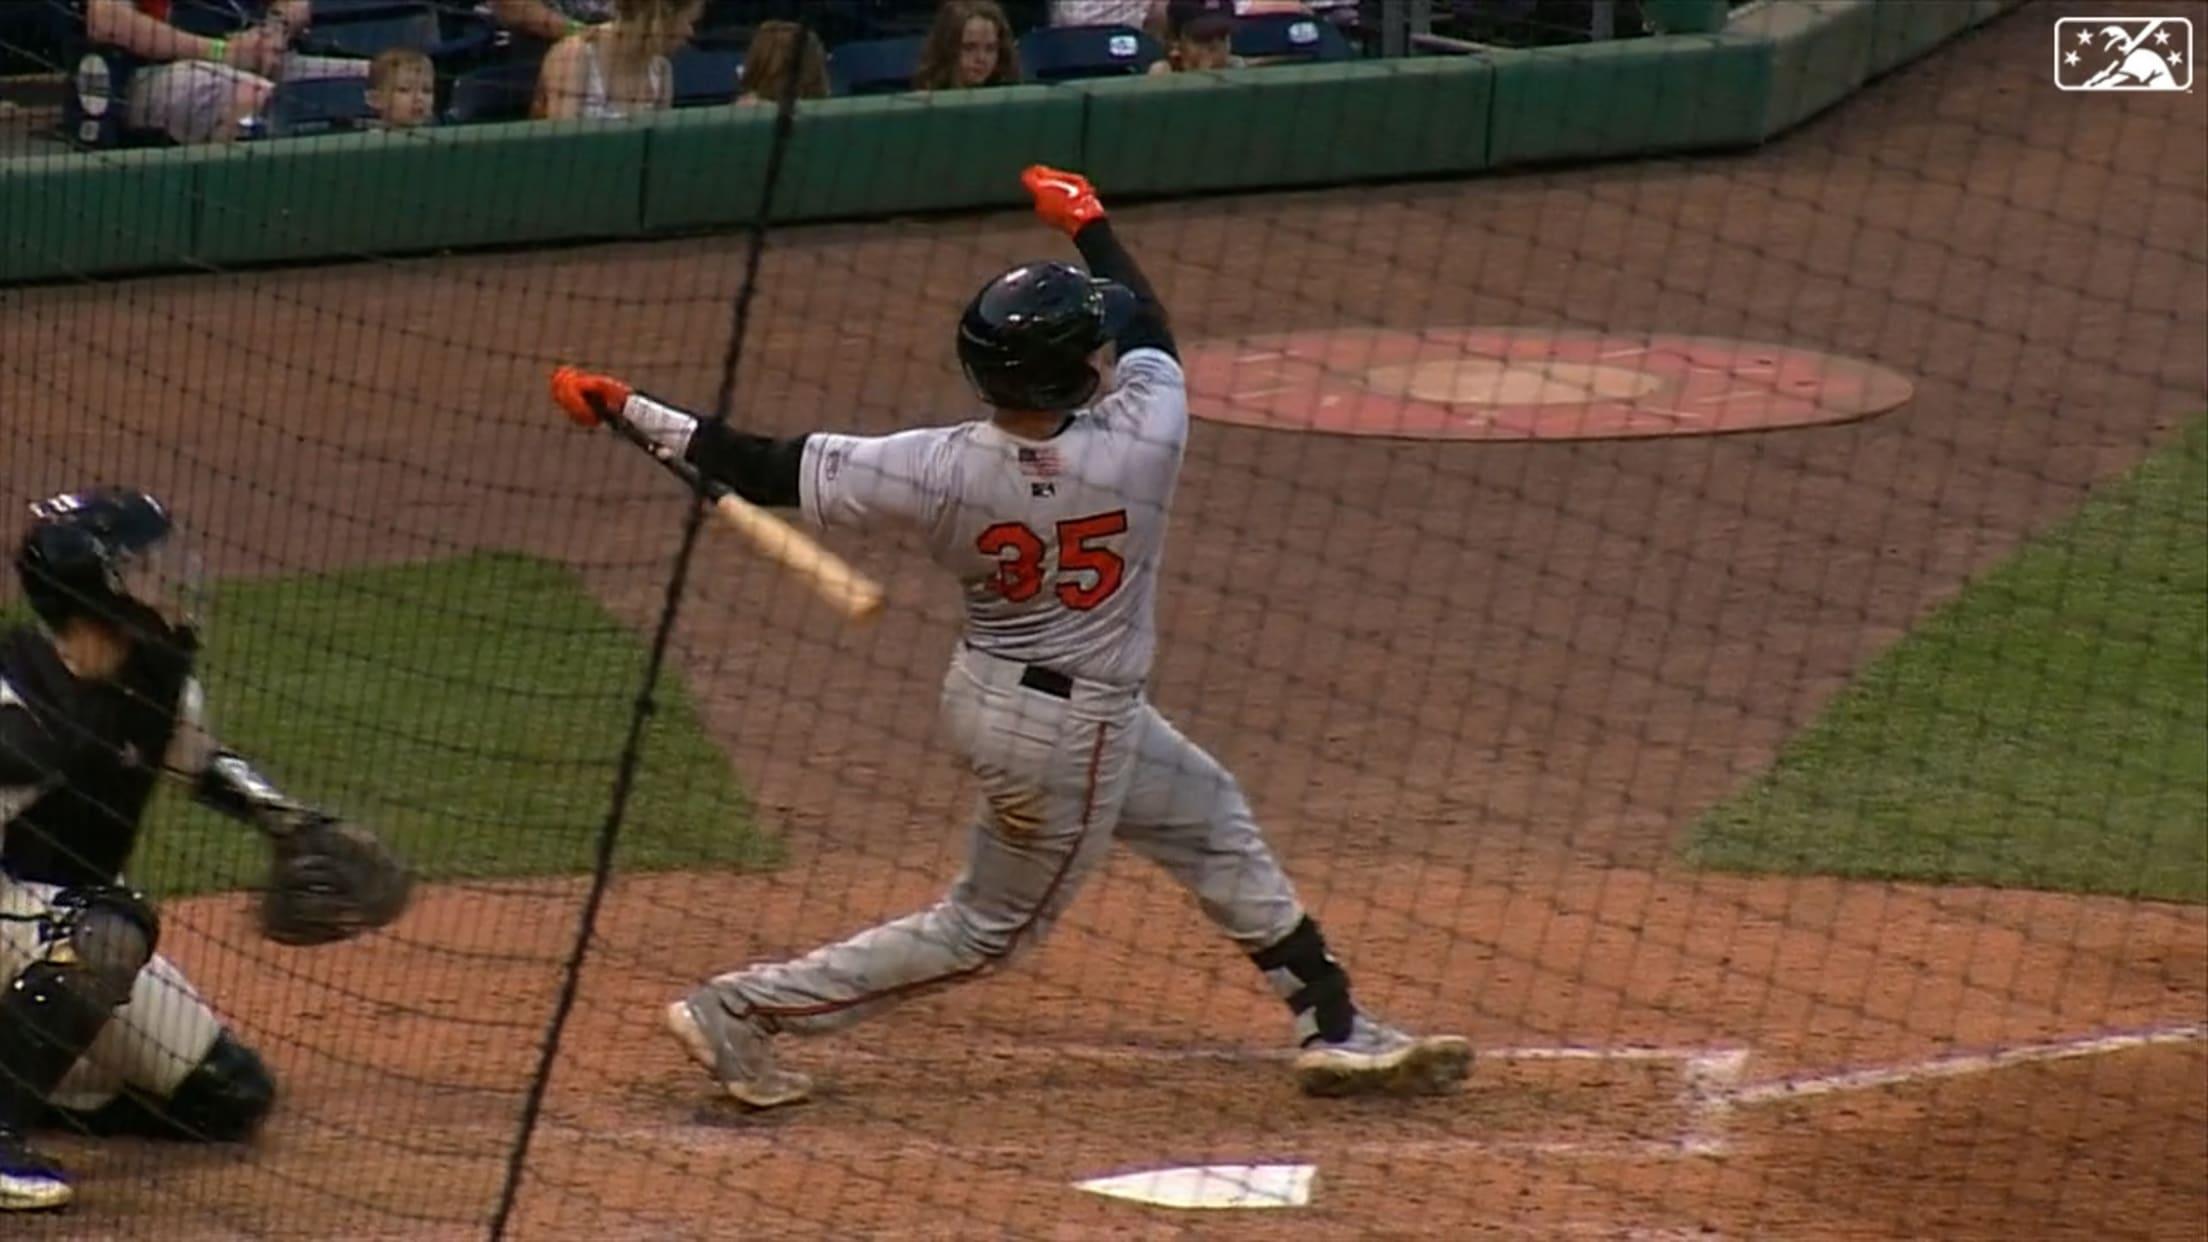 Rustchman's game-tying homer